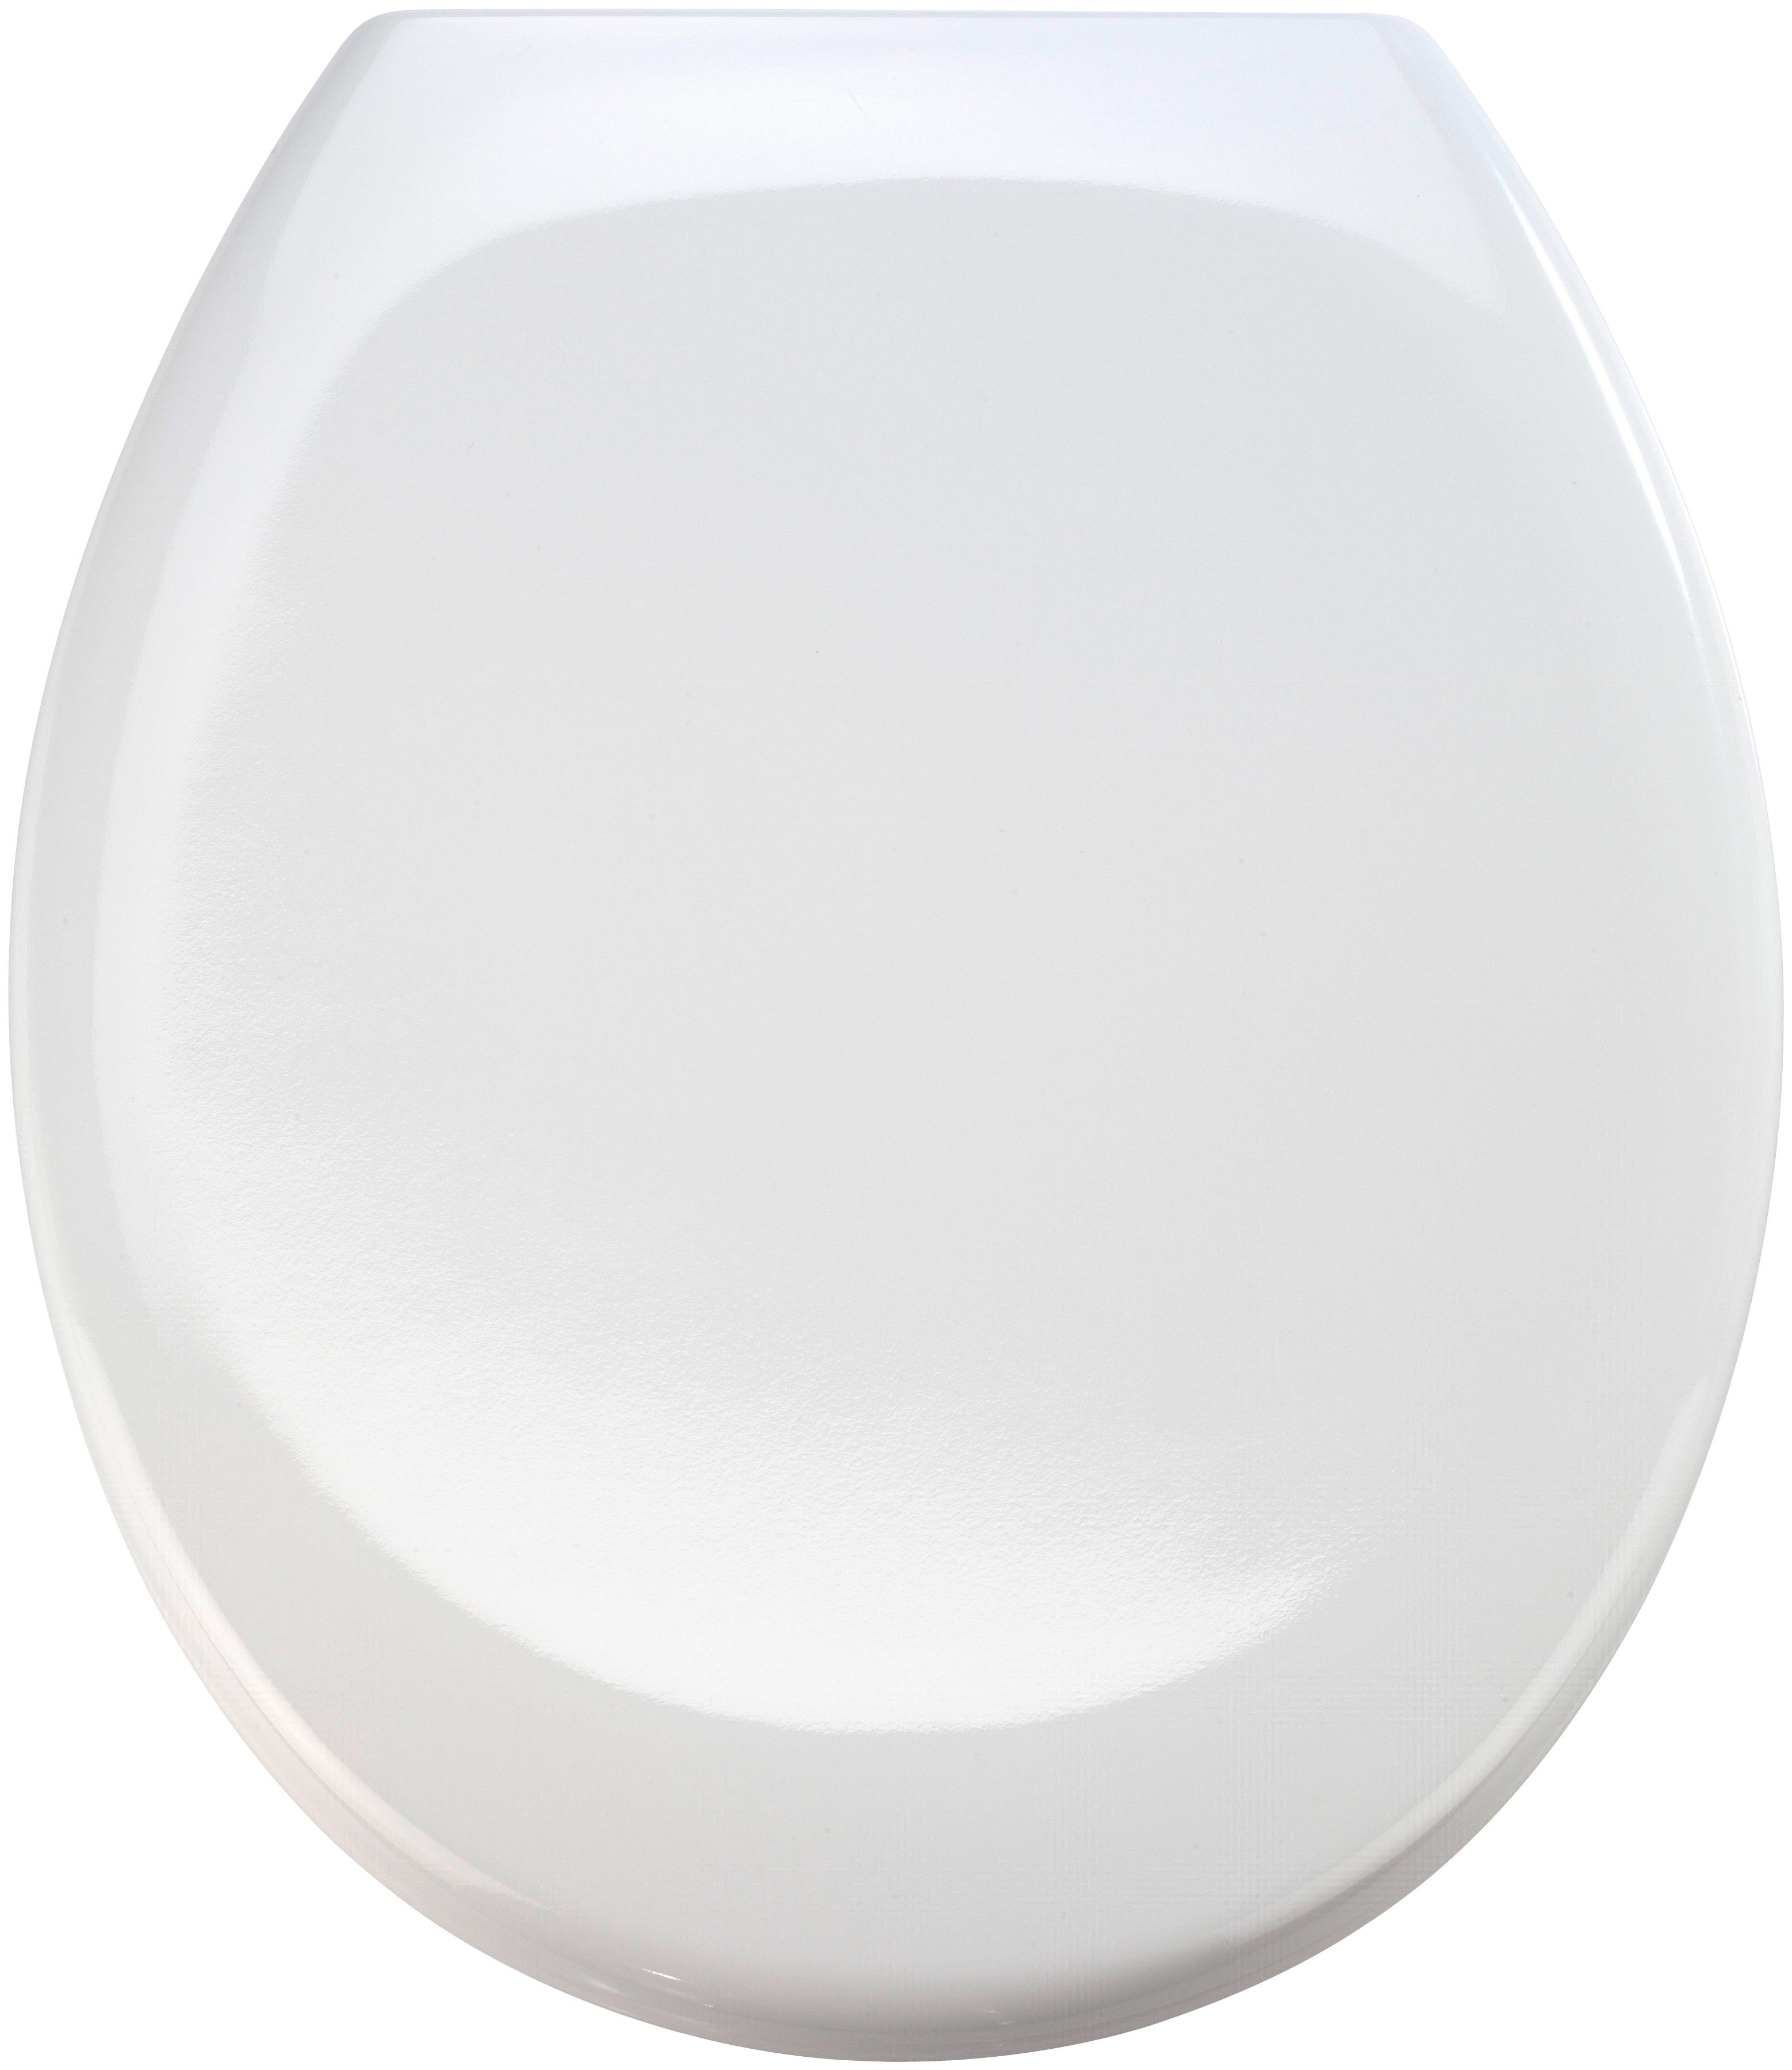 WC-Sitz »Ottana«, Mit Absenkautomatik